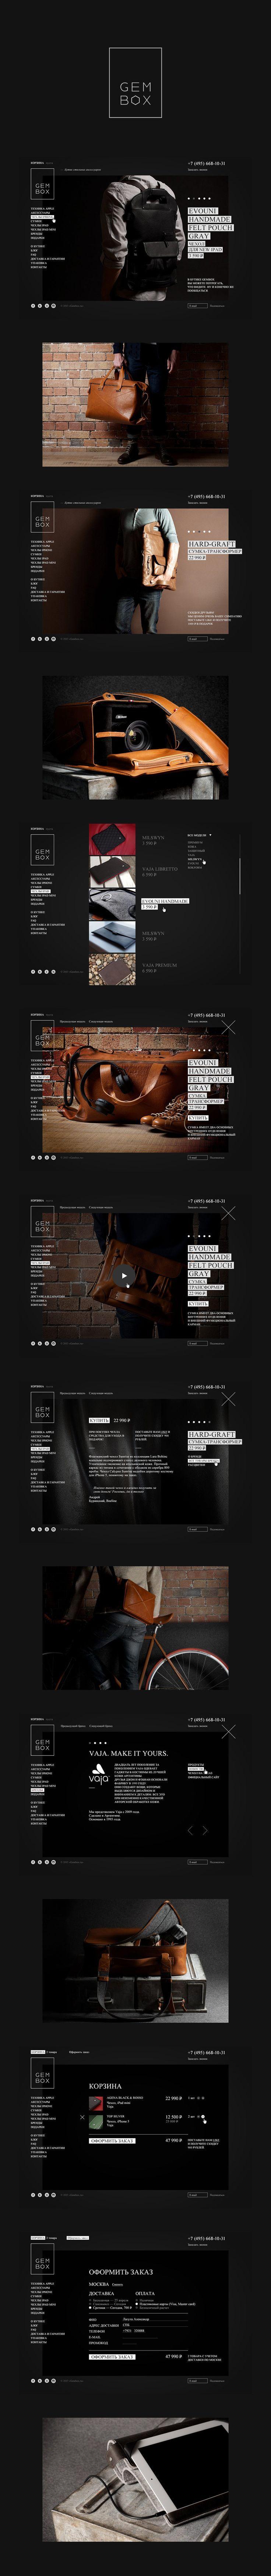 #webdesign | WEB DESIGN | Pinterest